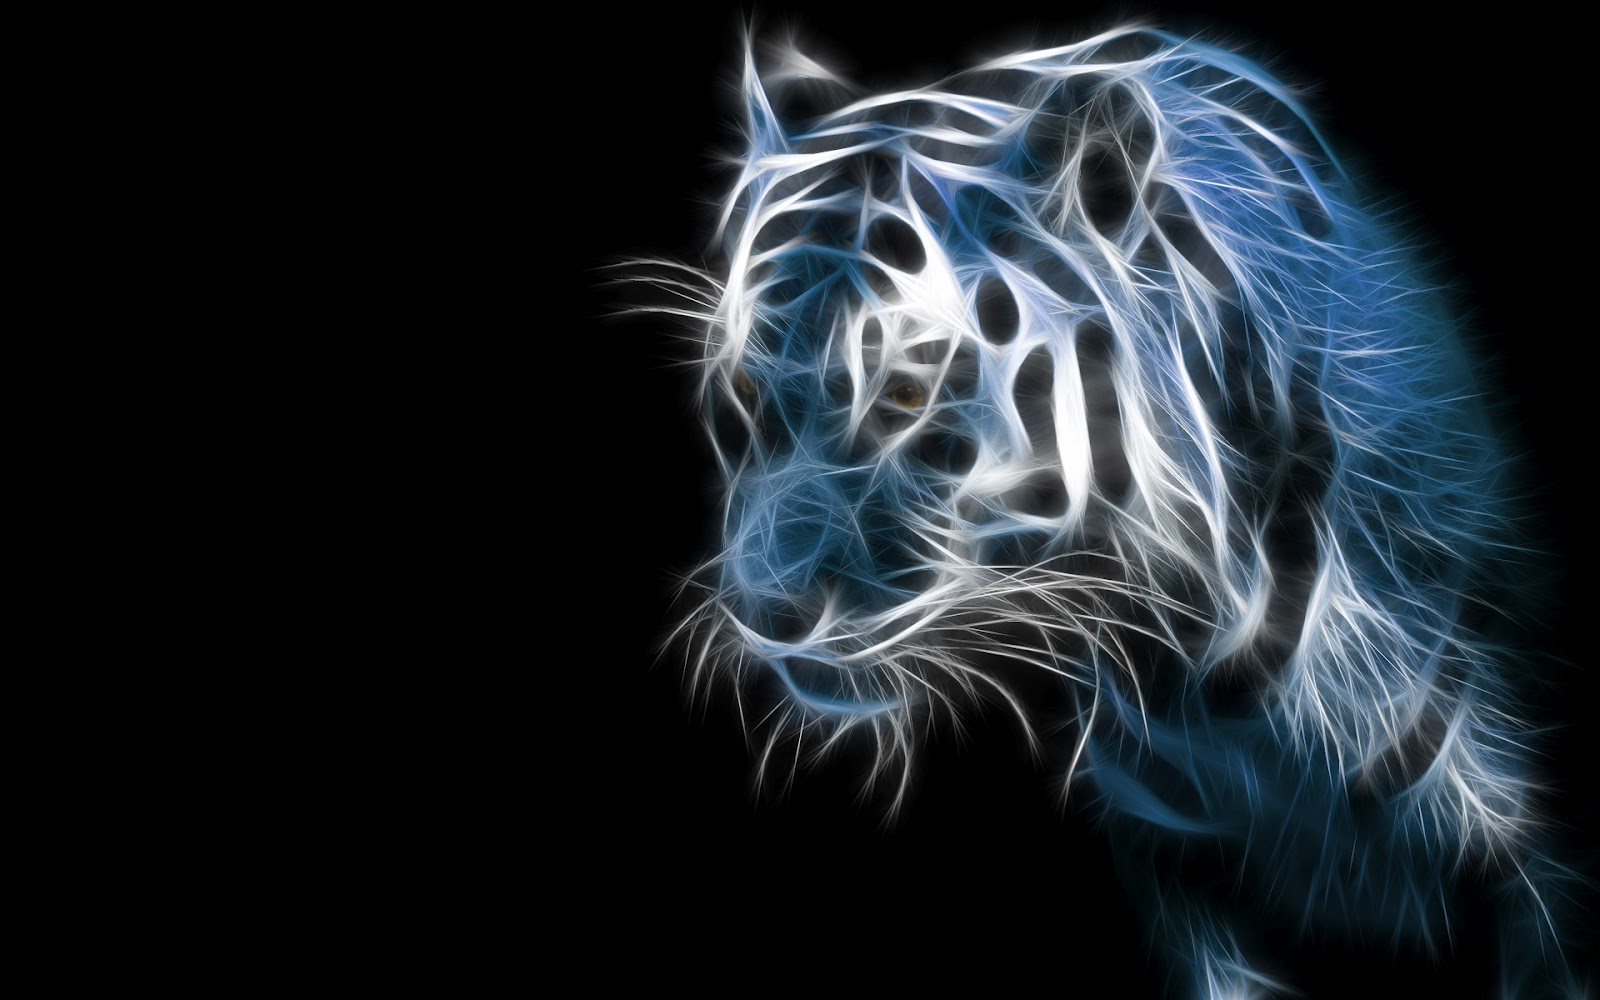 https://2.bp.blogspot.com/-gy9Au_Ohe0s/T-JGEuWlQFI/AAAAAAAAA3M/MTGnUROS964/s1600/animal-3d-wallpapers-hd.jpg